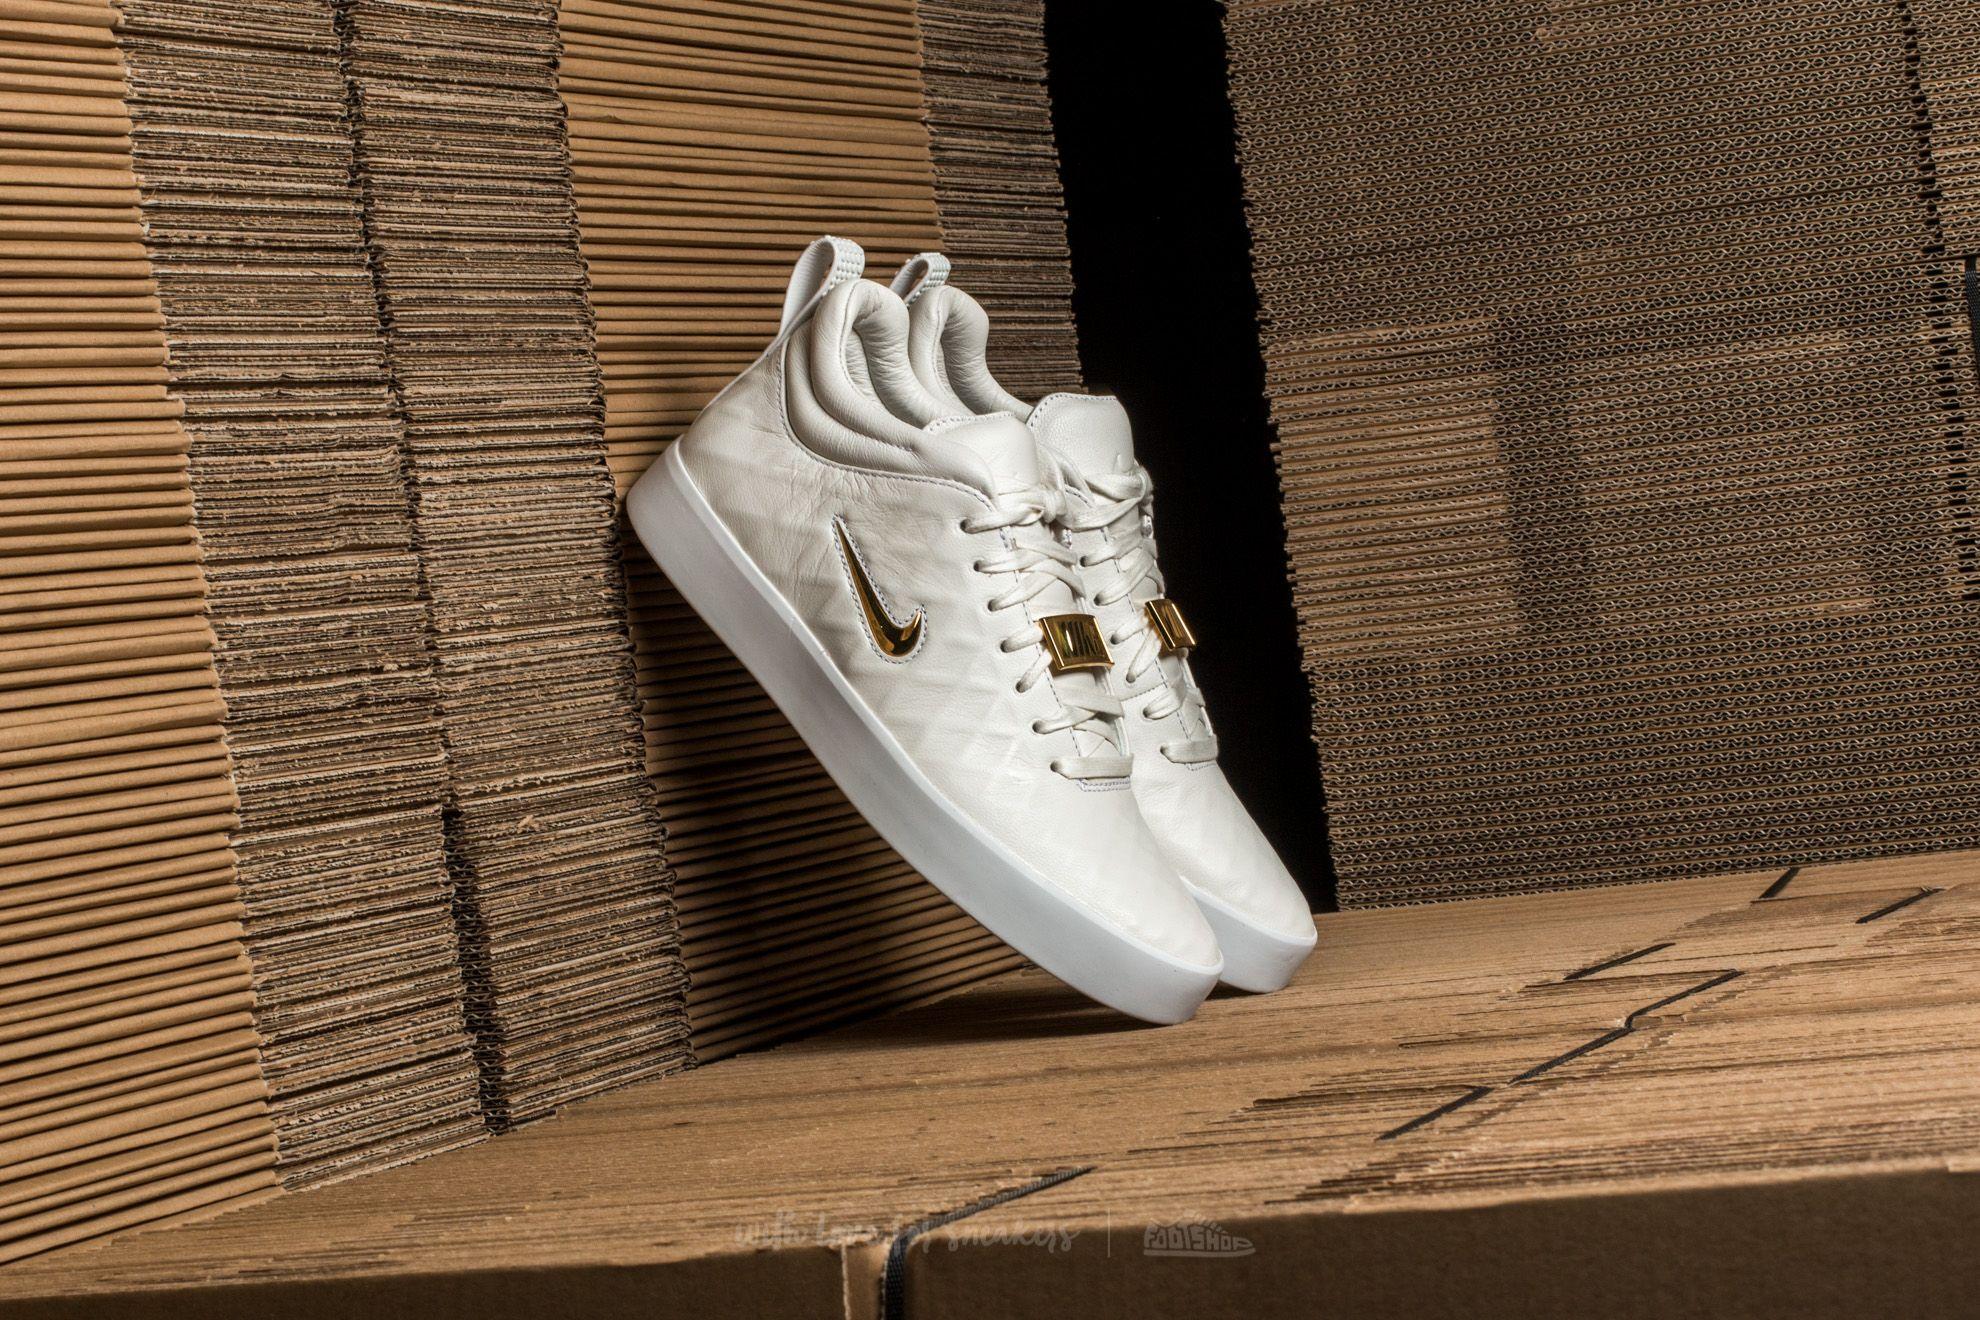 Nike Tiempo Vetta '17 Ivory/ Metallic Gold-White - 13053